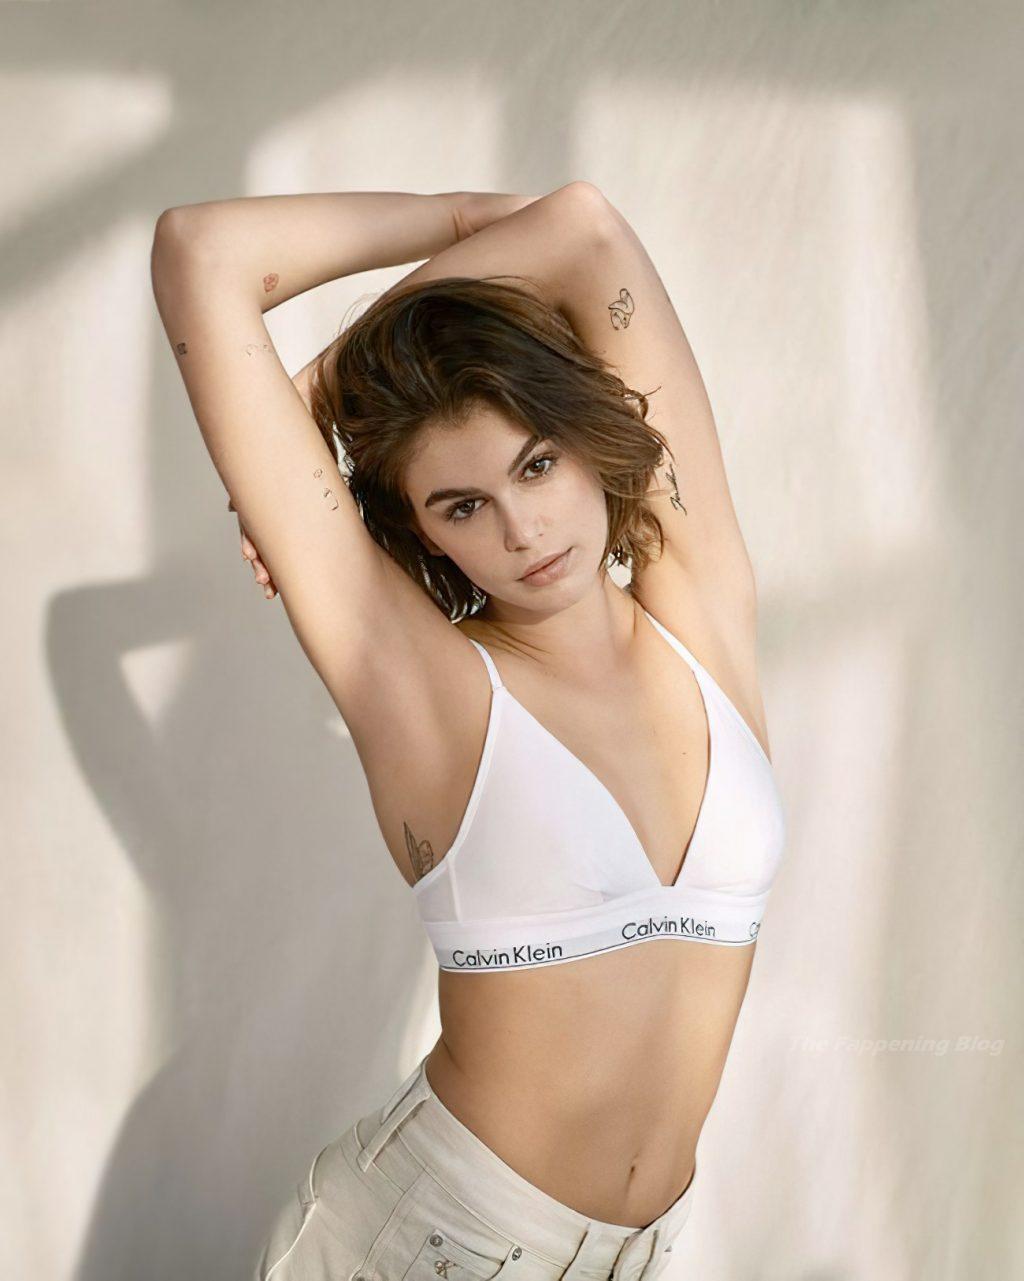 Kaia Gerber Poses Topless for Calvin Klein's New Underwear Campaign (6 Photos)